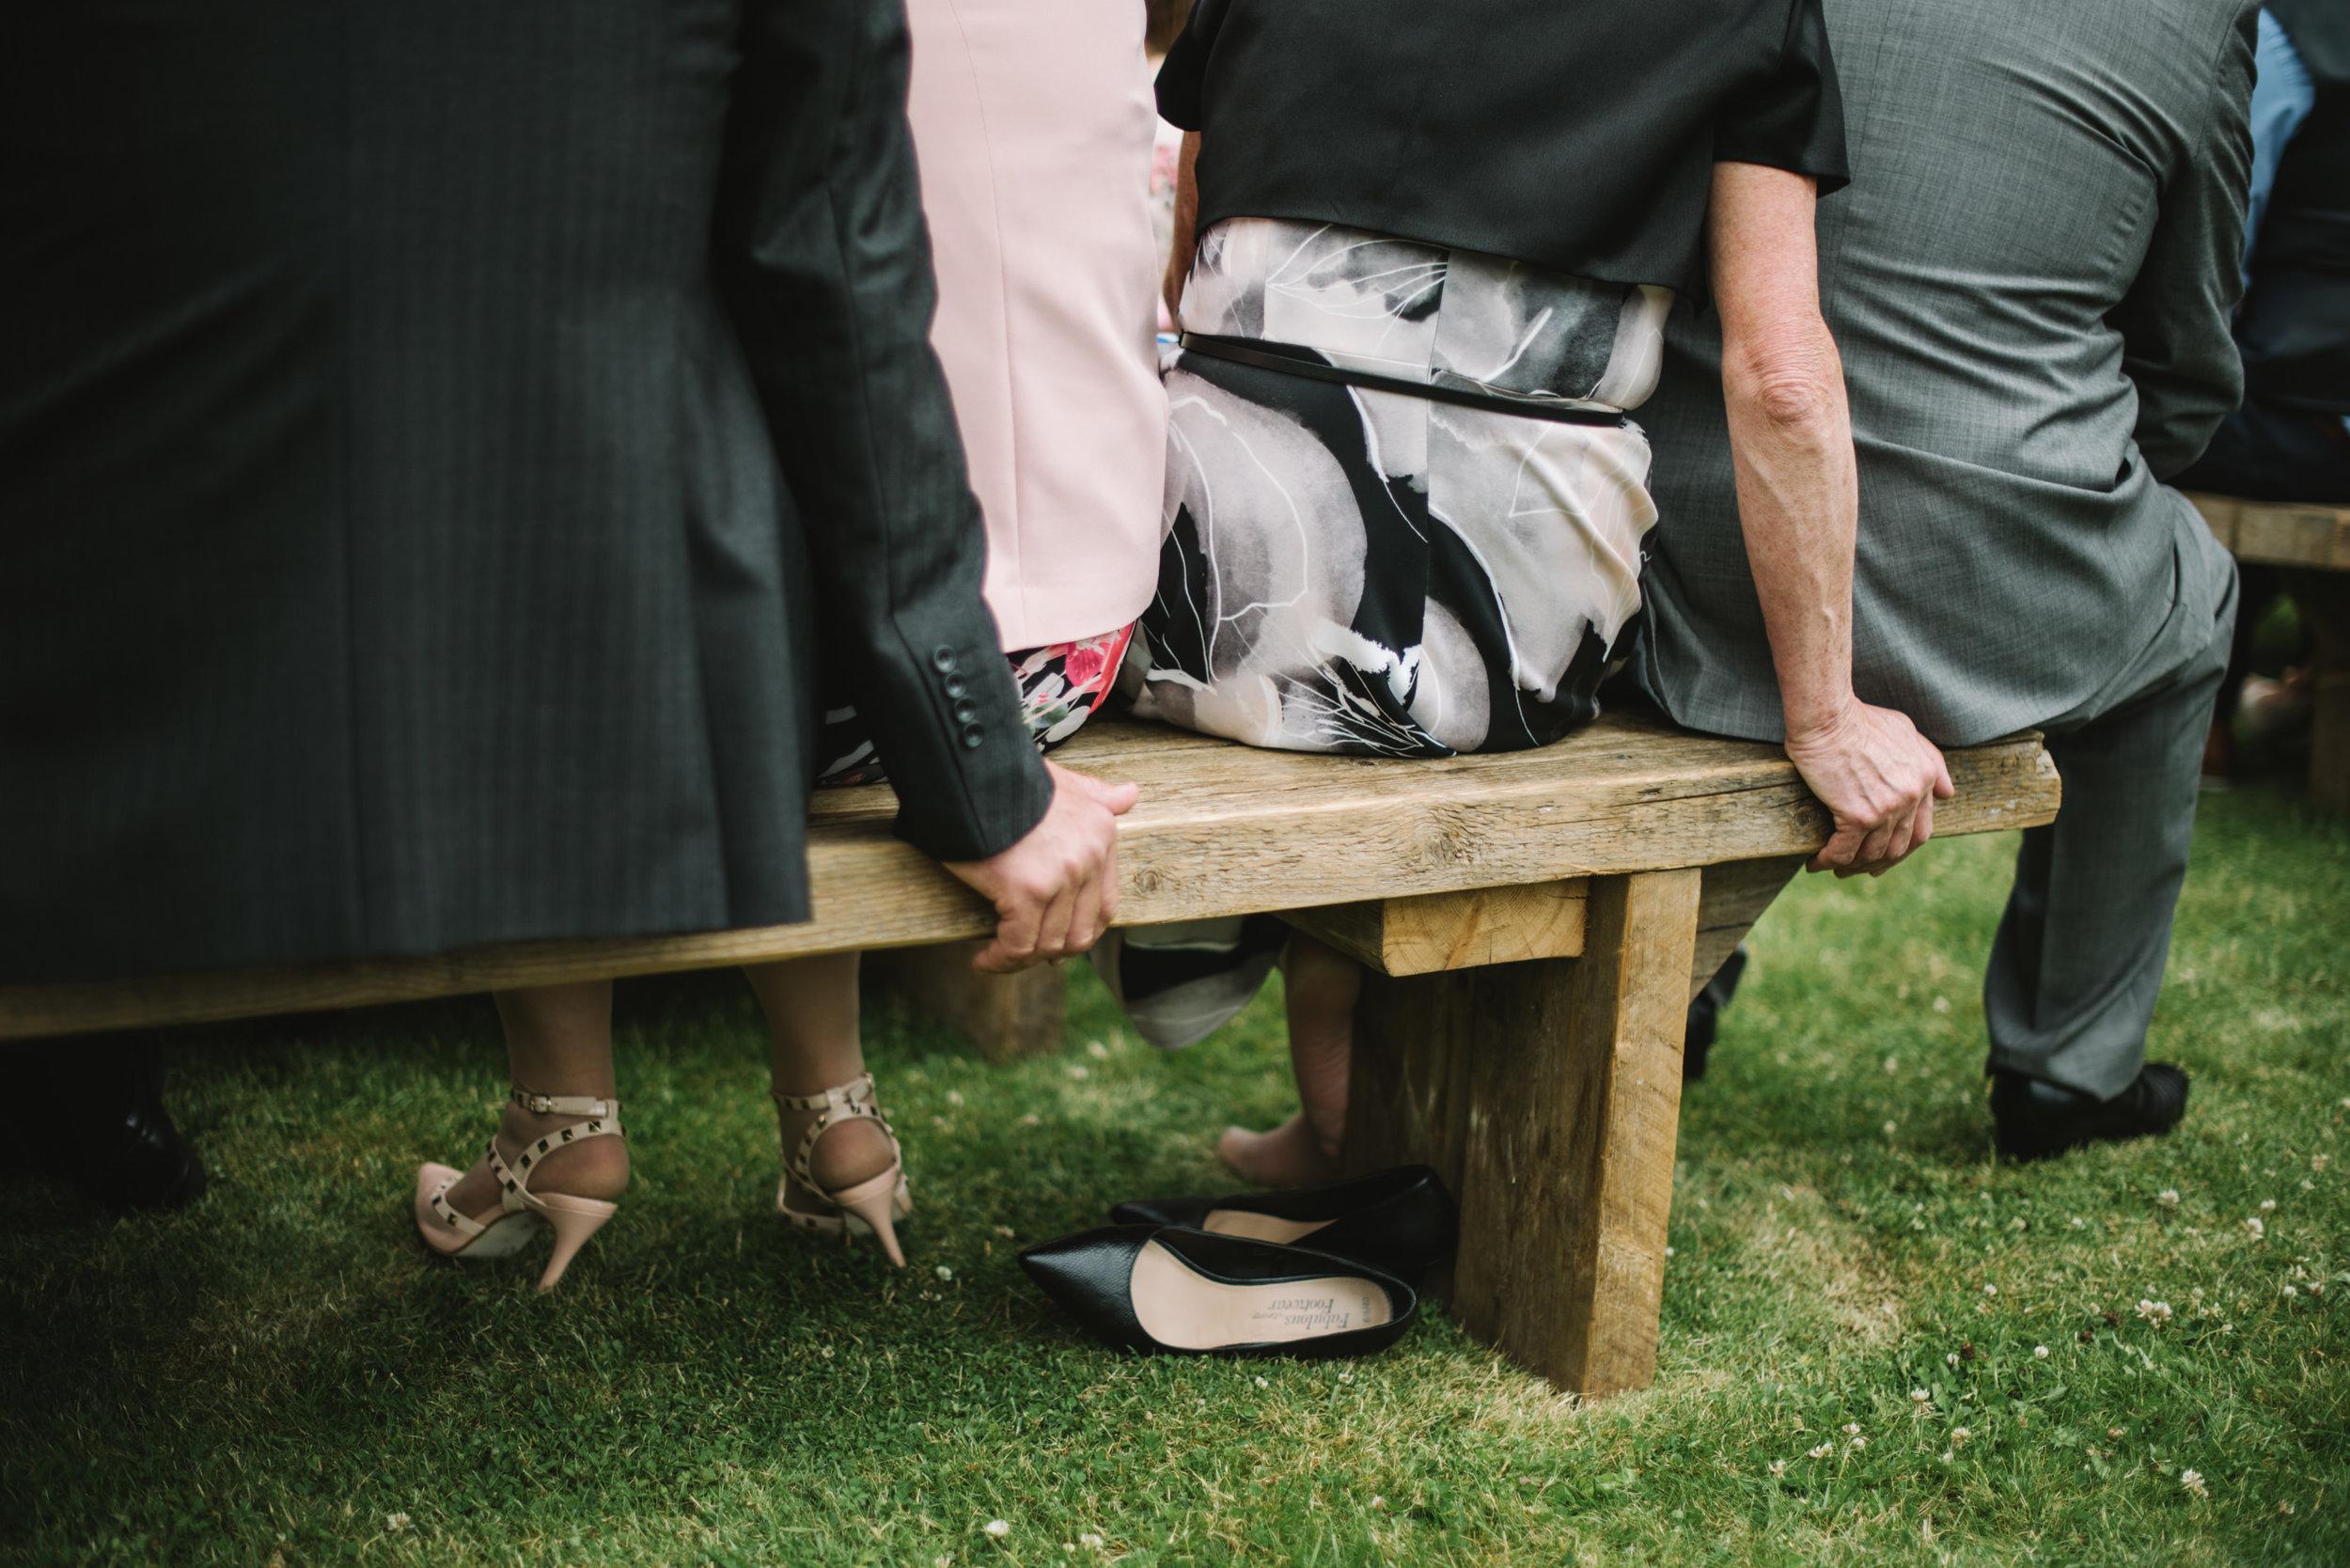 0210-LISA-DEVINE-PHOTOGRAPHY-ALTERNATIVE-WEDDING-PHOTOGRAPHY-SCOTLAND-DESTINATION-WEDDINGS-GLASGOW-WEDDINGS-COOL-WEDDINGS-STYLISH-WEDDINGS.JPG